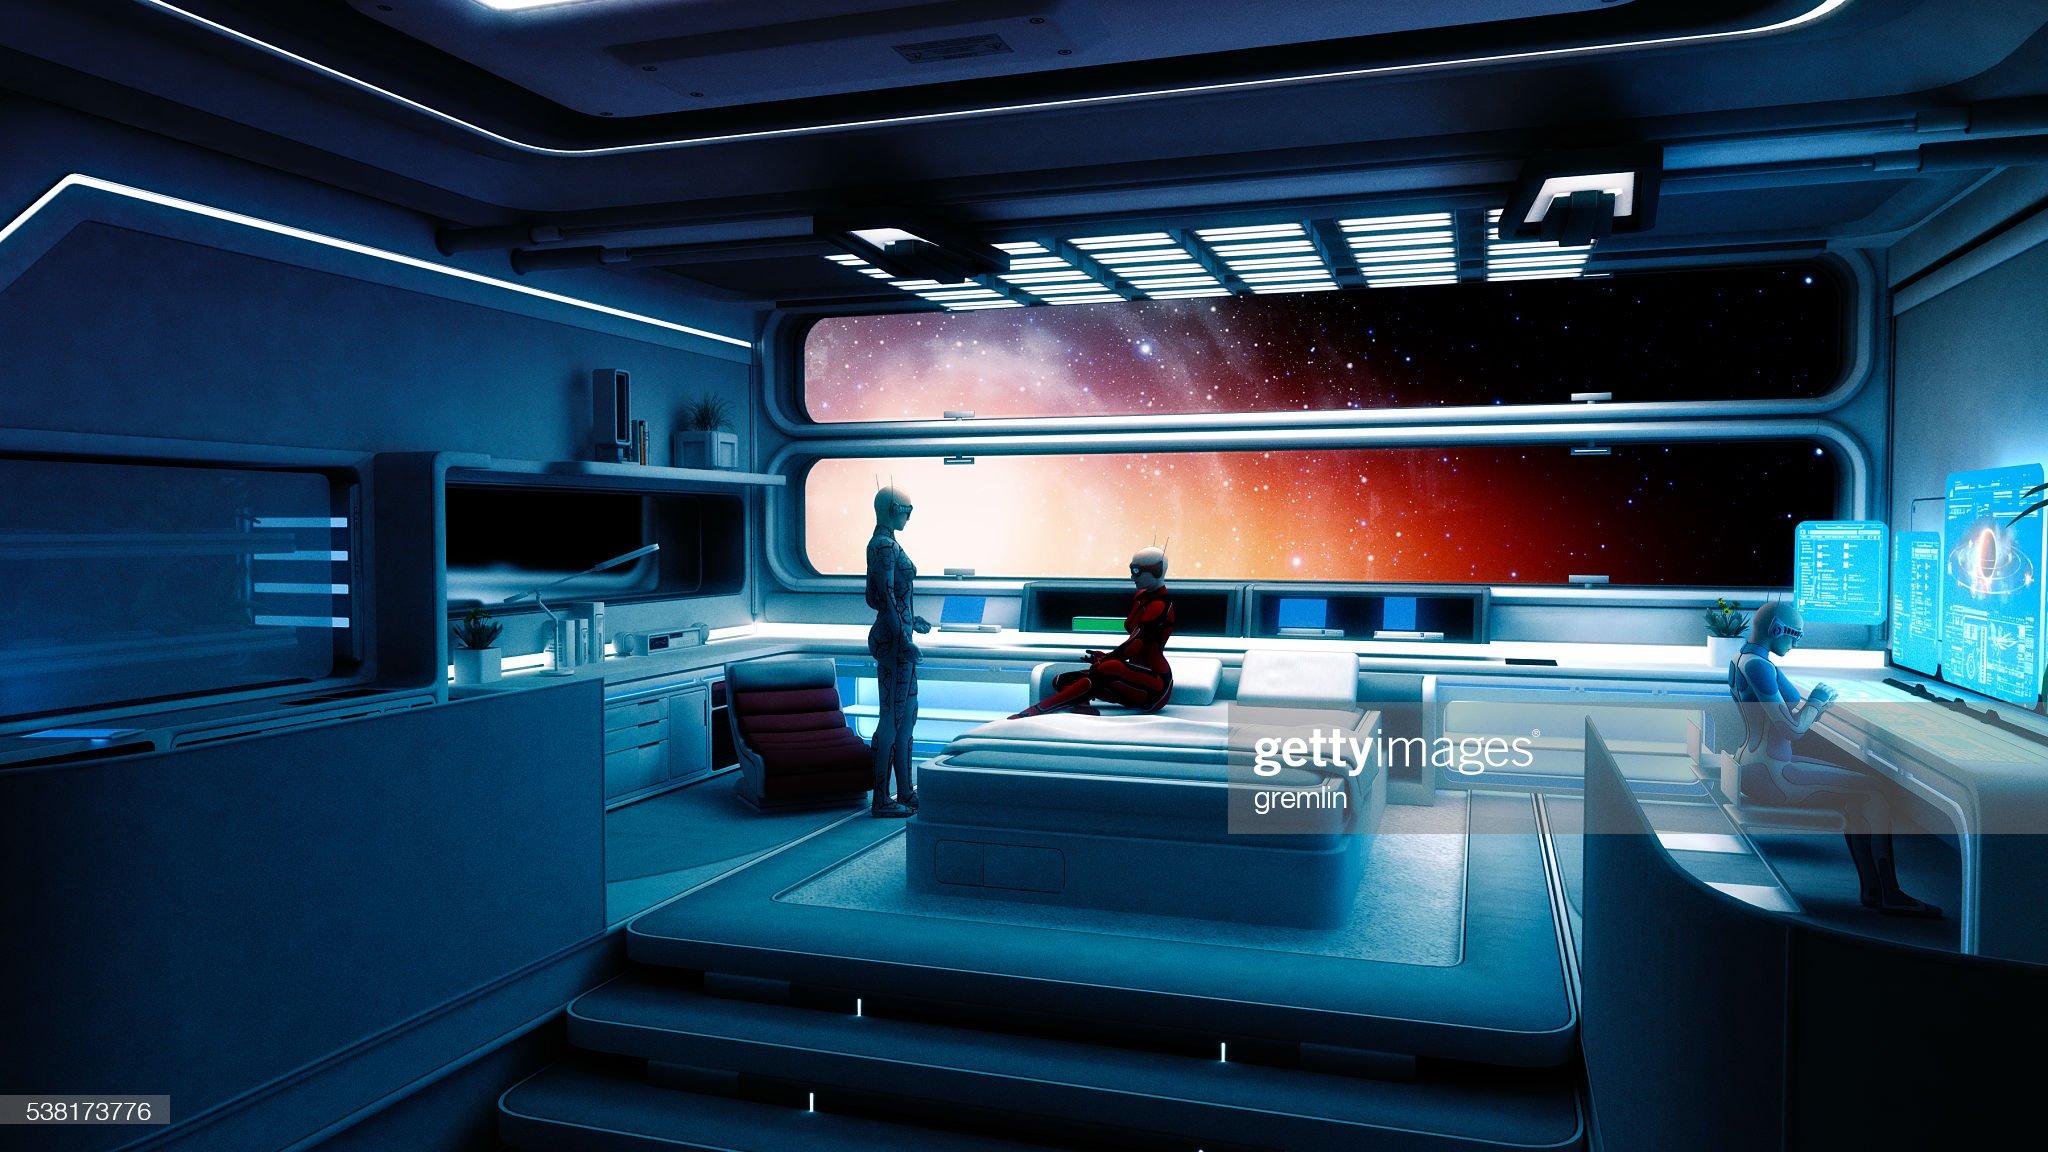 cyborg-astronauts-spaceship-interstellar-travel-picture-id538173776?s=2048x2048